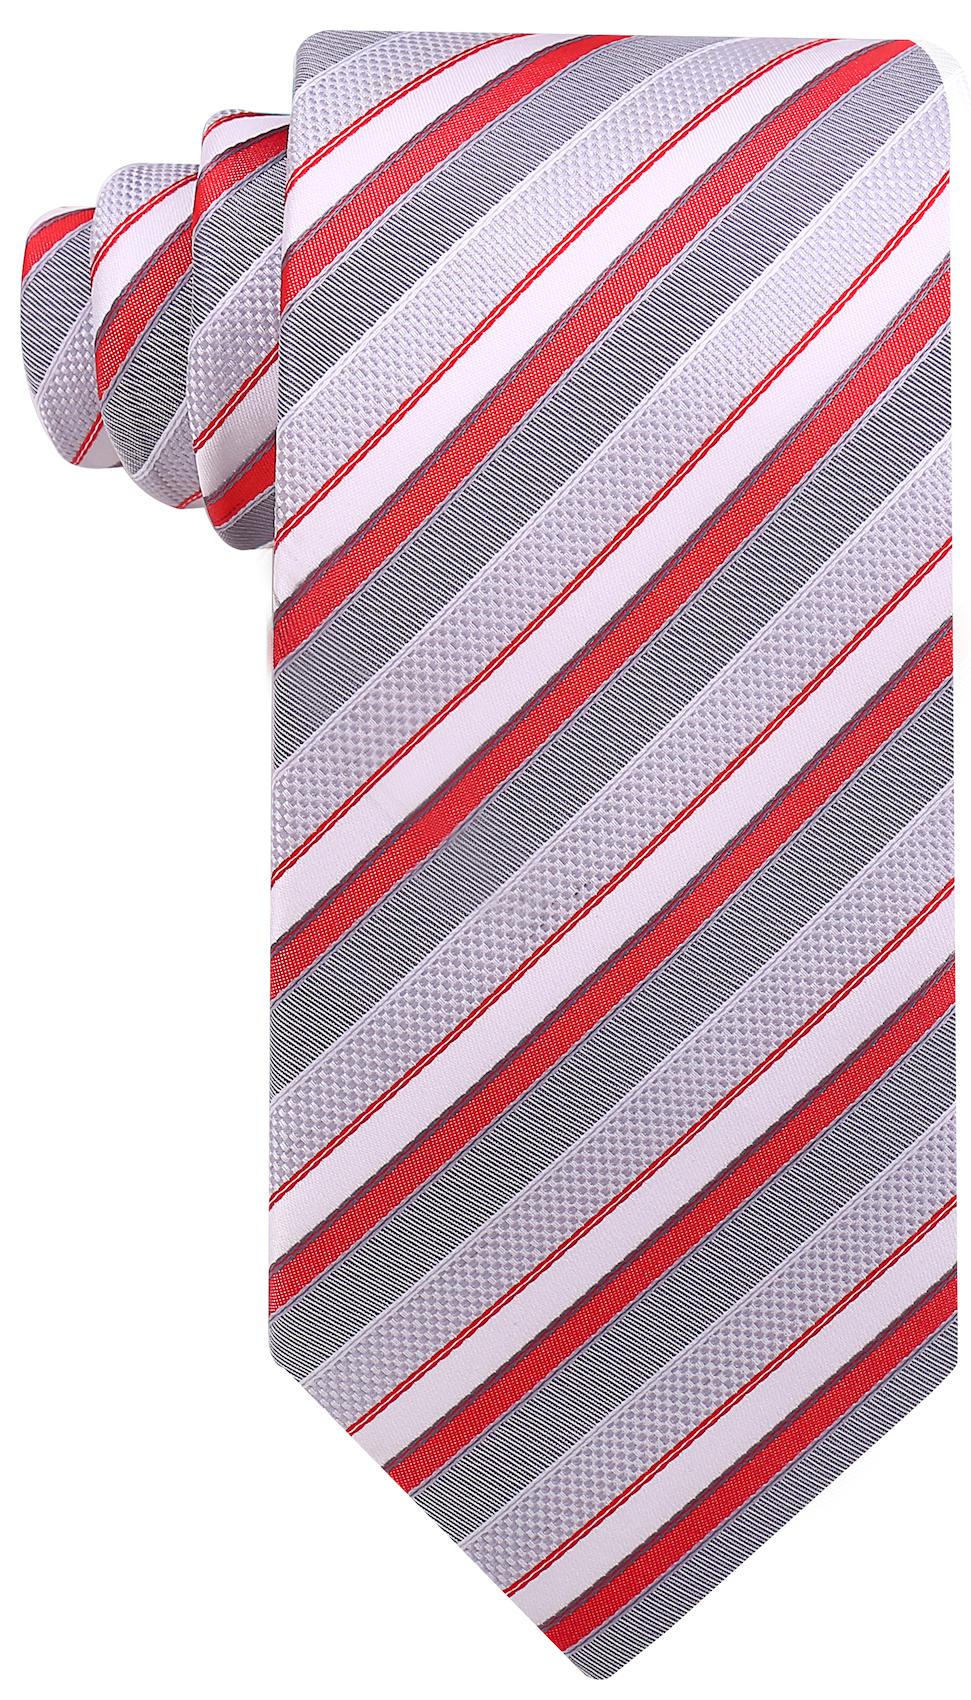 Scott-Allan-Striped-Necktie-Mens-Ties-in-Various-Colors thumbnail 24